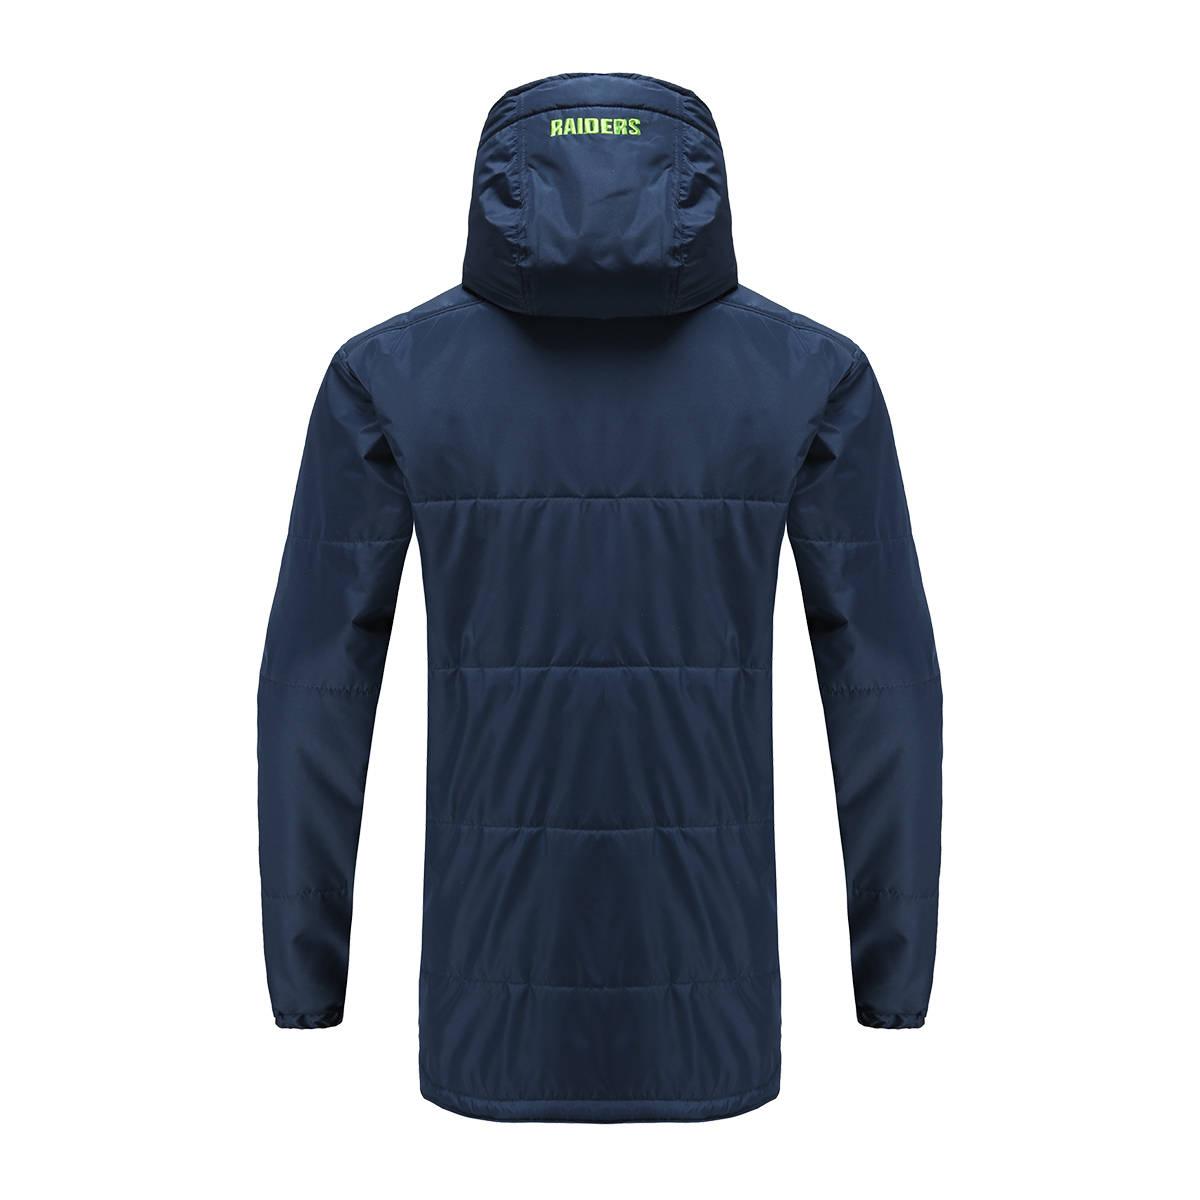 2021 Coaches Jacket2